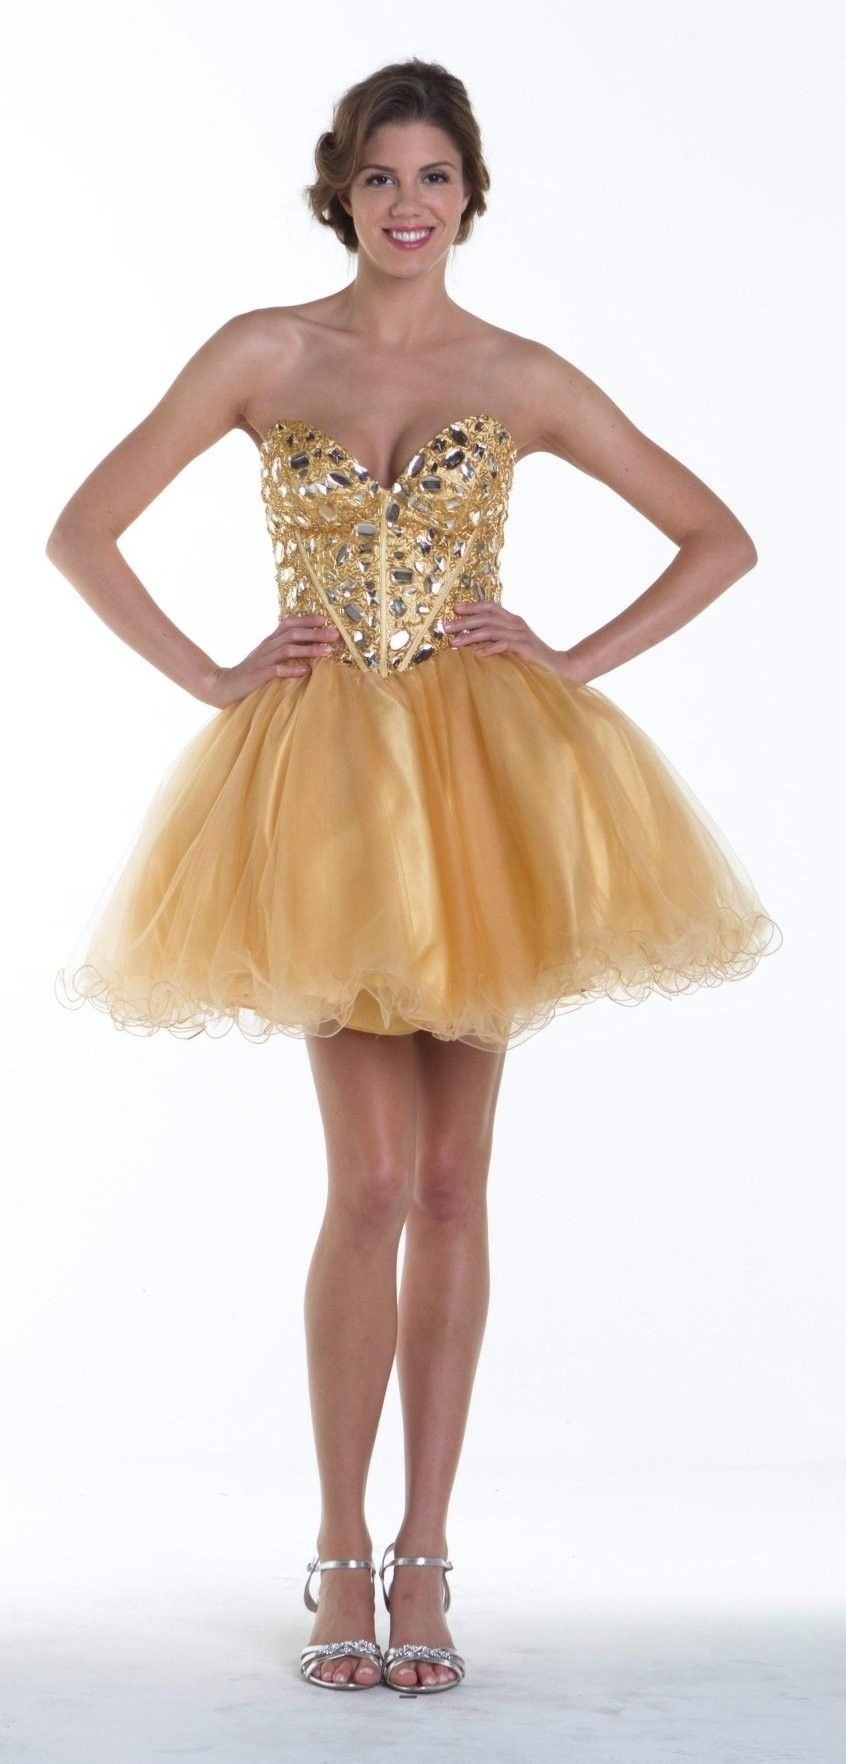 Flirty Sparkling Poofy Short Gold Prom Dress Boned Bodice (2 Colors ...